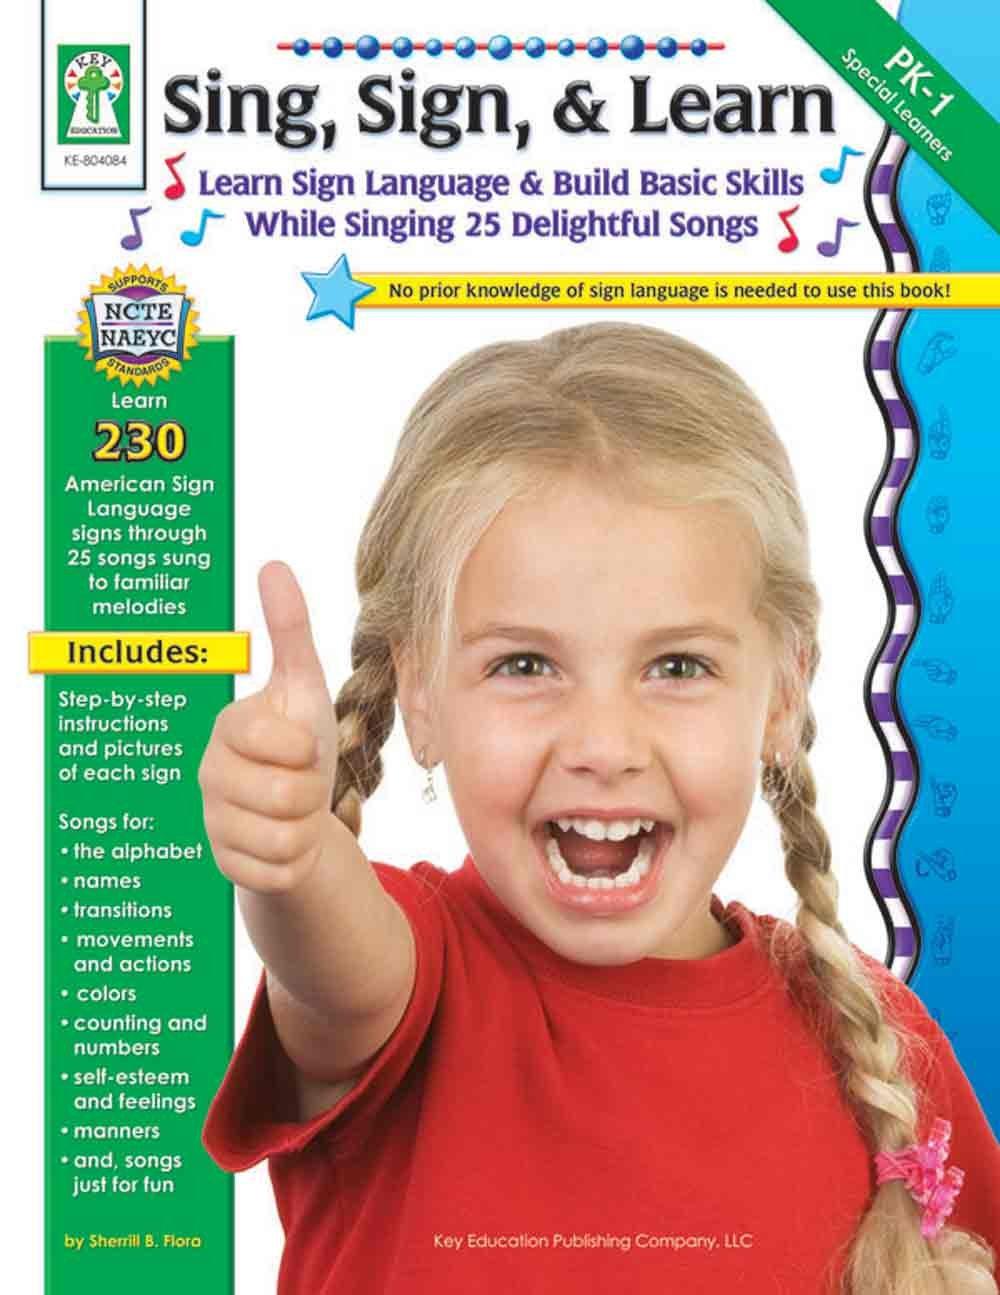 Sing Sign & Learn! Key Education Resource Book (804084) Grades PreK - 1: Learn Sign Language & Build Basic Skills